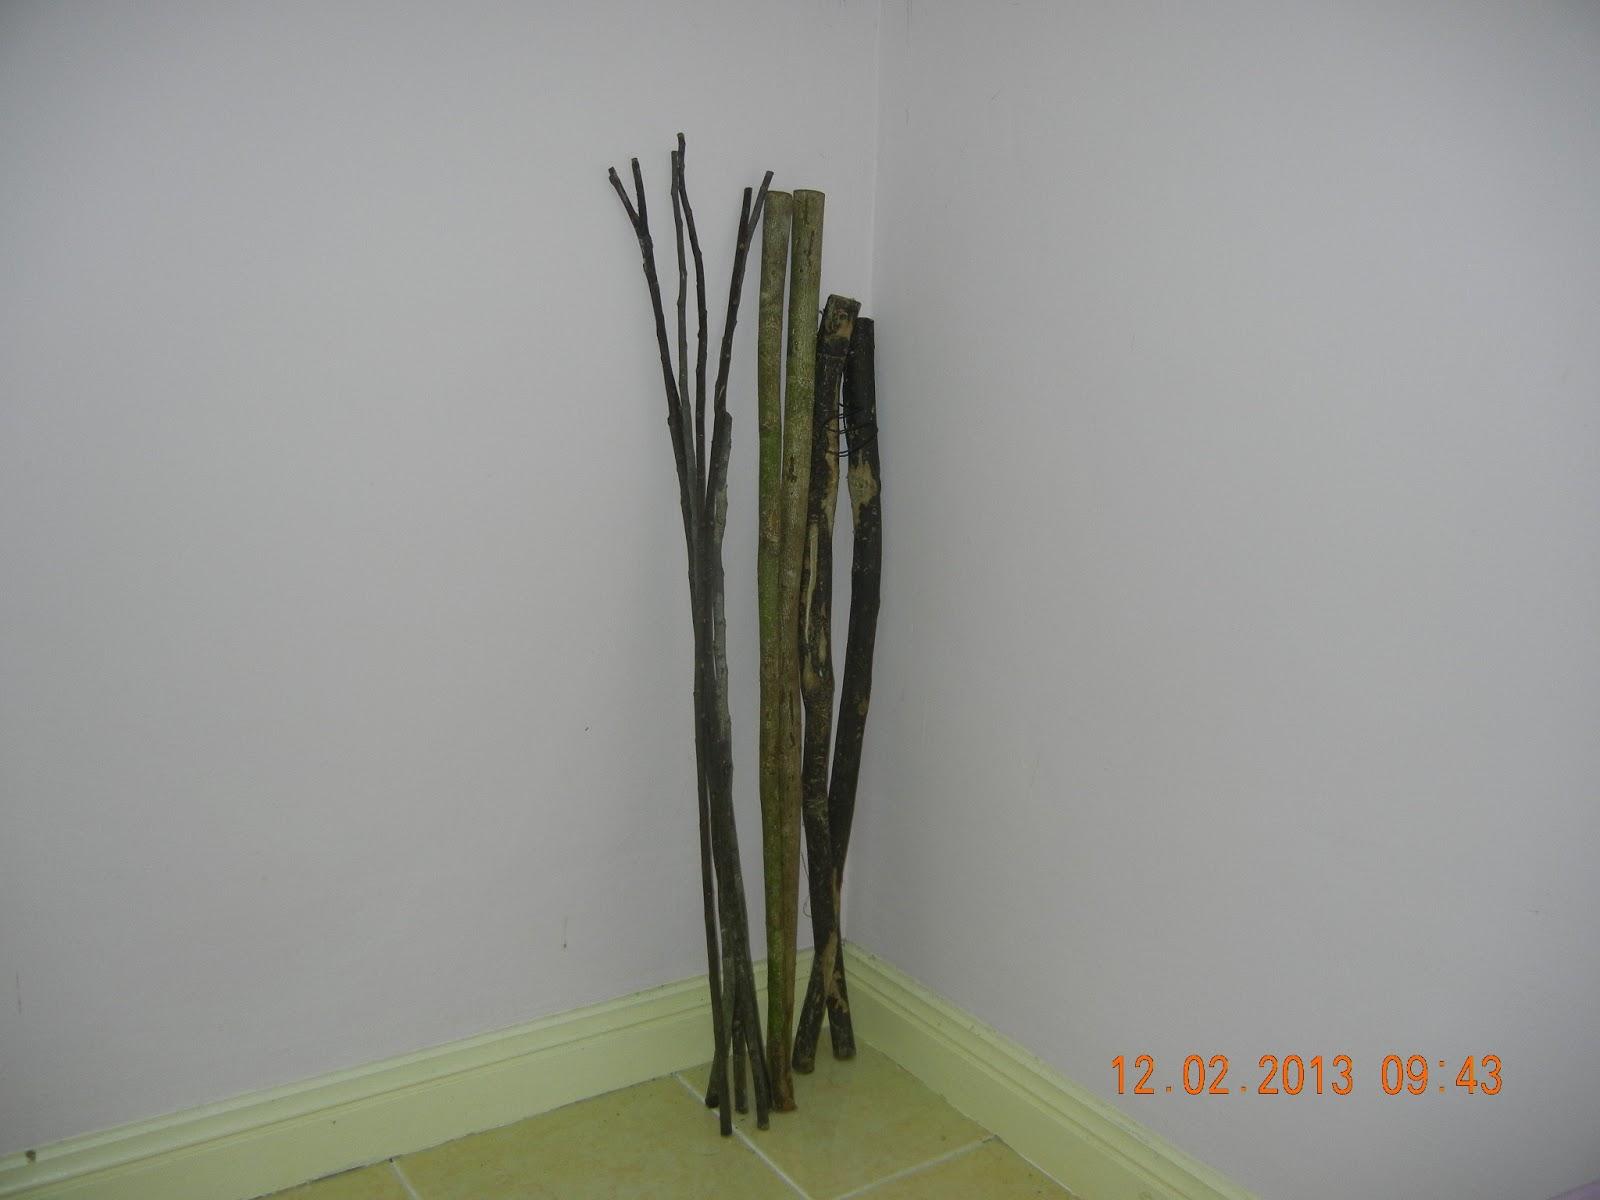 kayu limpanas sabah atau kayu tas hitam dan kayu tas putih memang